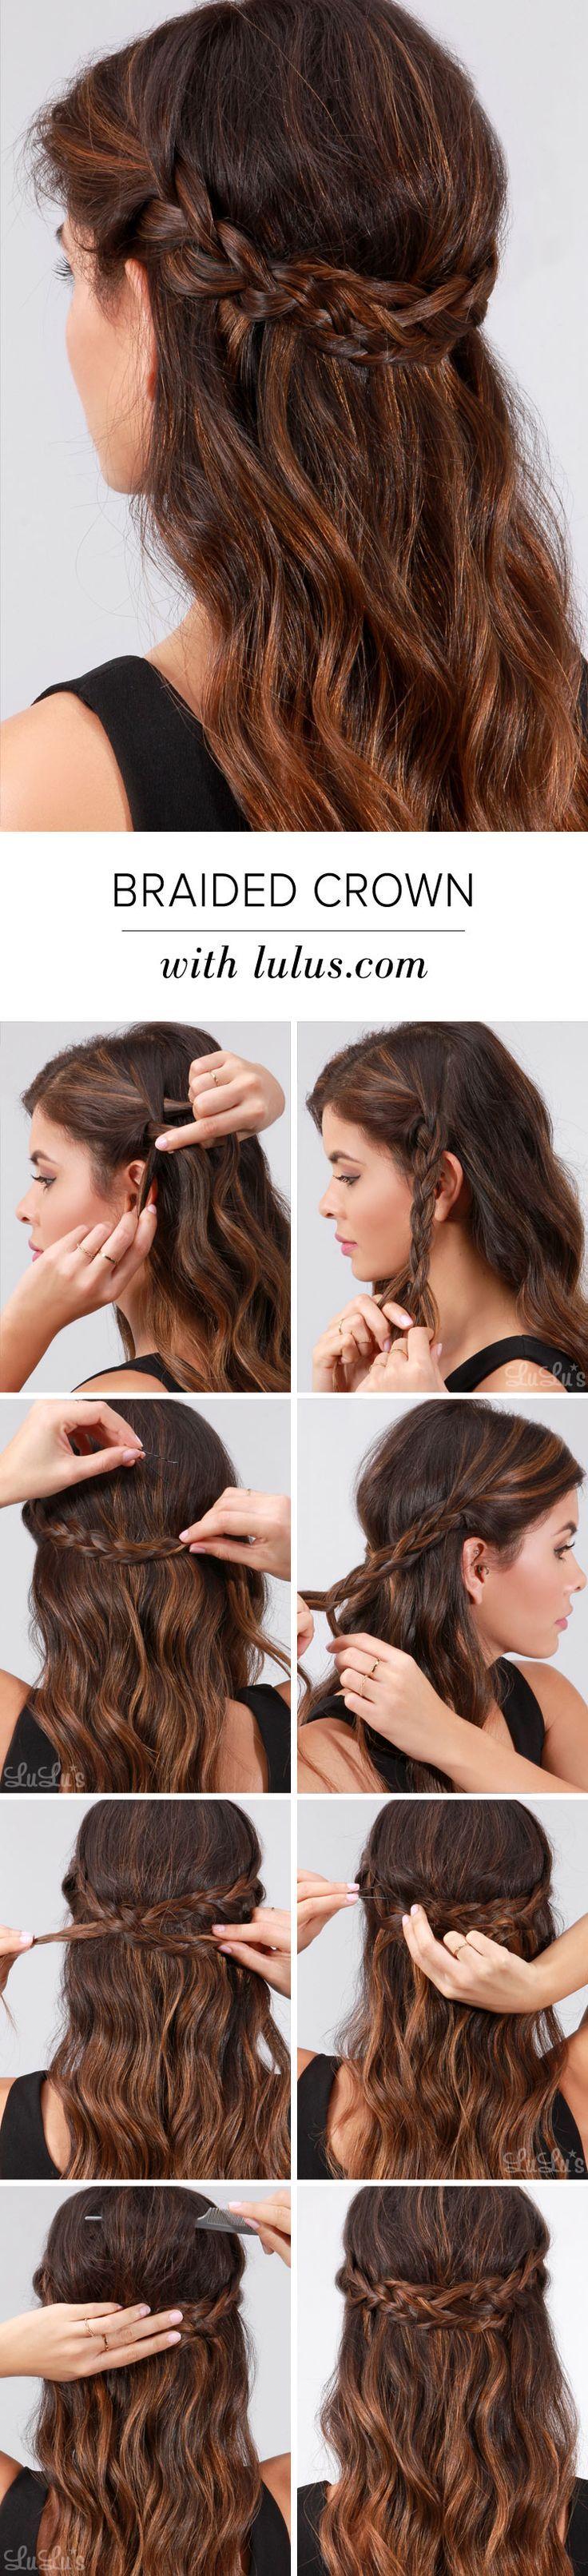 Lulus How-To: Braided Crown Hair Tutorial - Lulus.com Fashion Blog